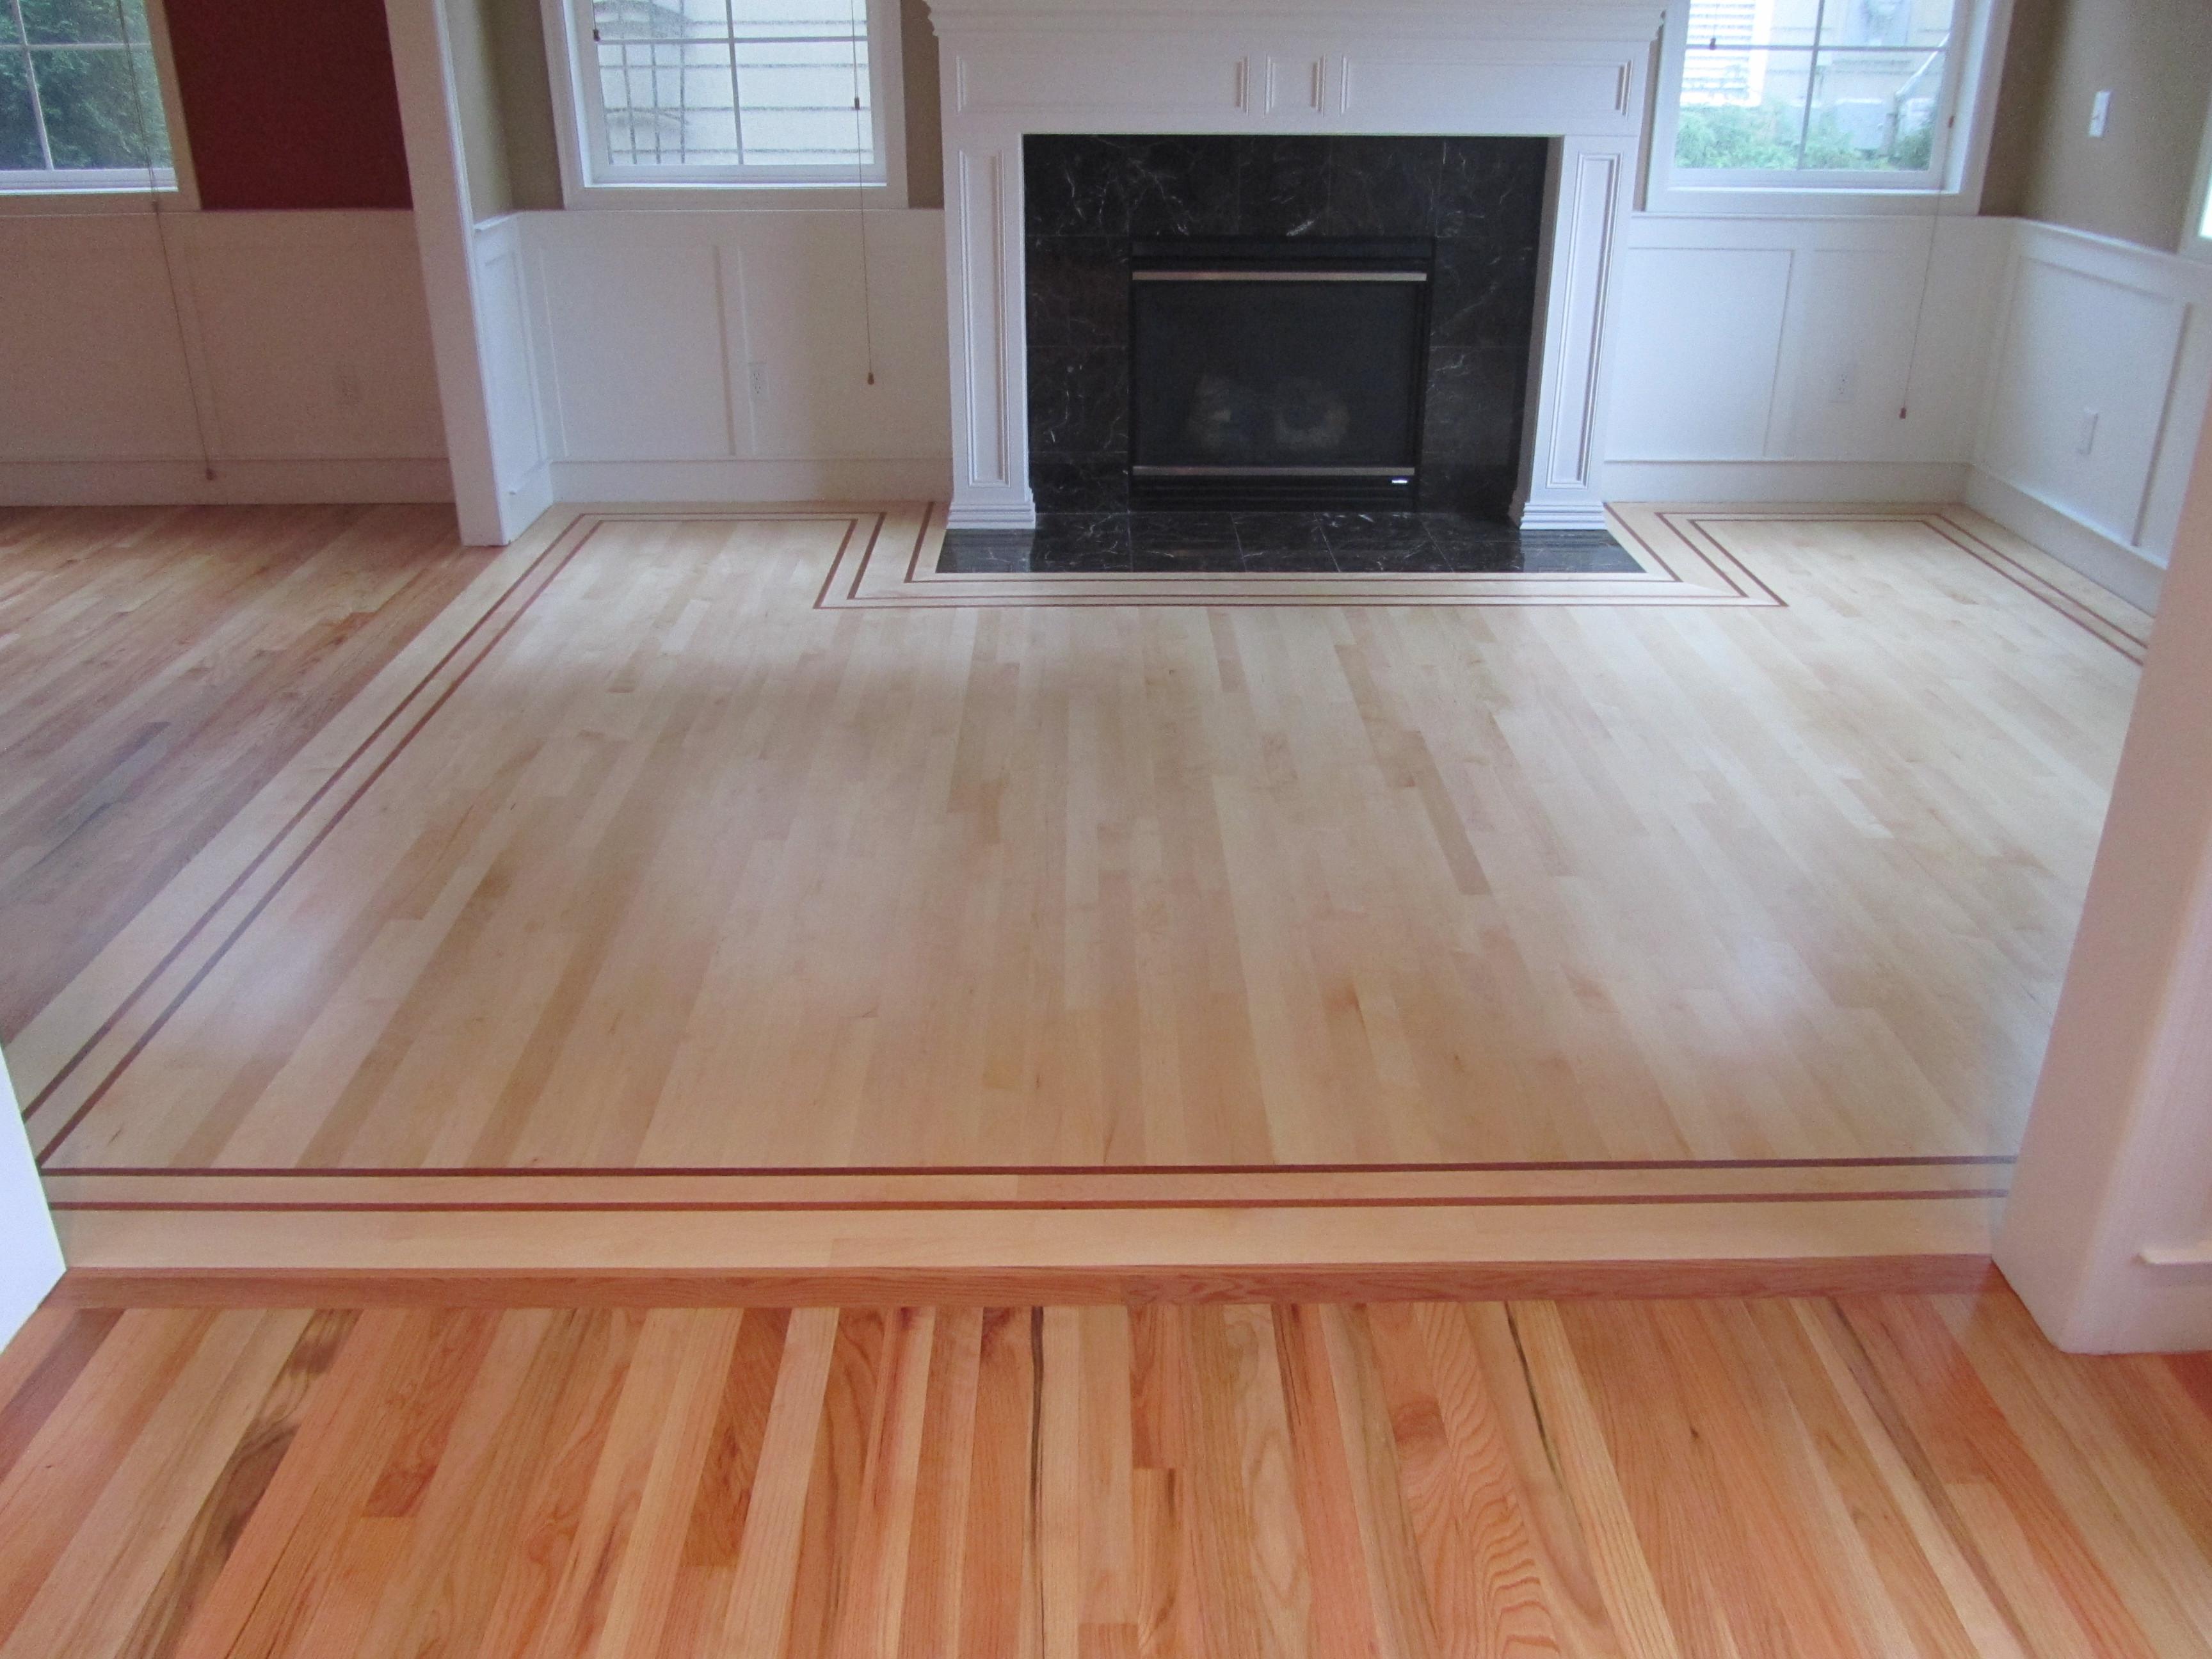 hardwood floors upstairs of hardwood floor refinishing richmond va floor transition laminate to with regard to hardwood floor refinishing richmond va hardwood flooring contractor